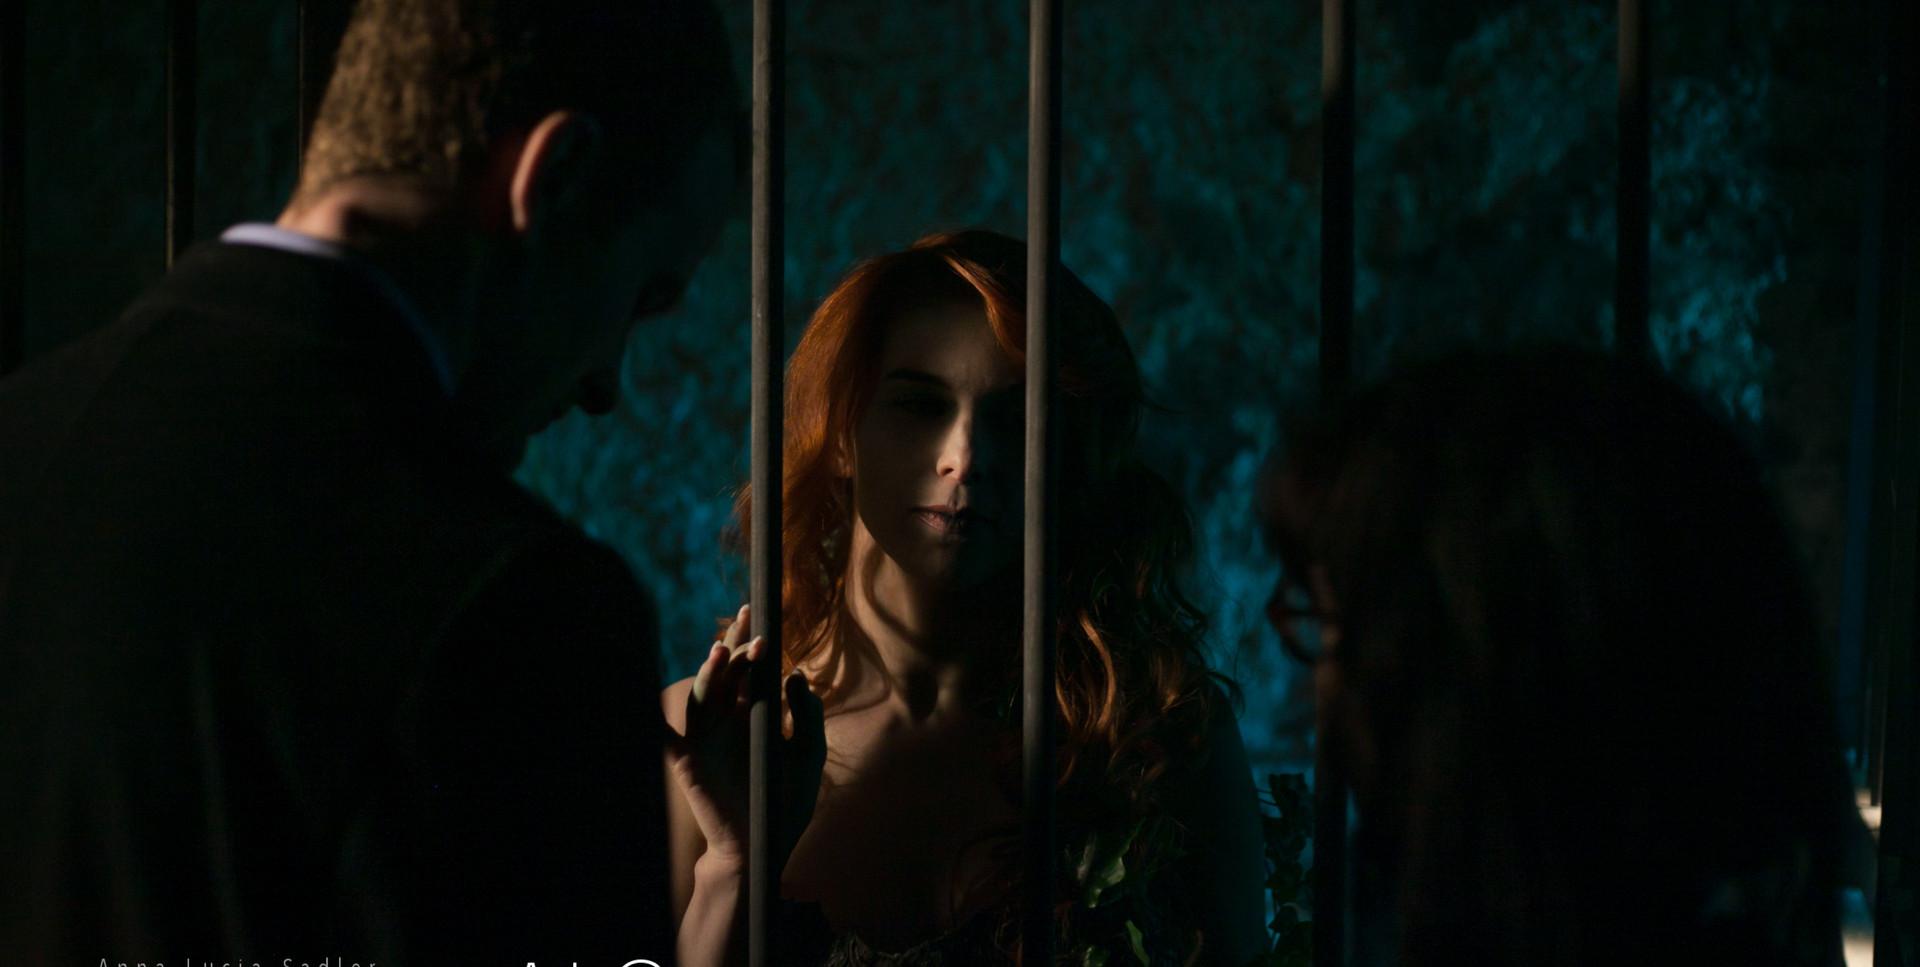 Robert Dukes & Aislinn De'Ath with director Sophie Black